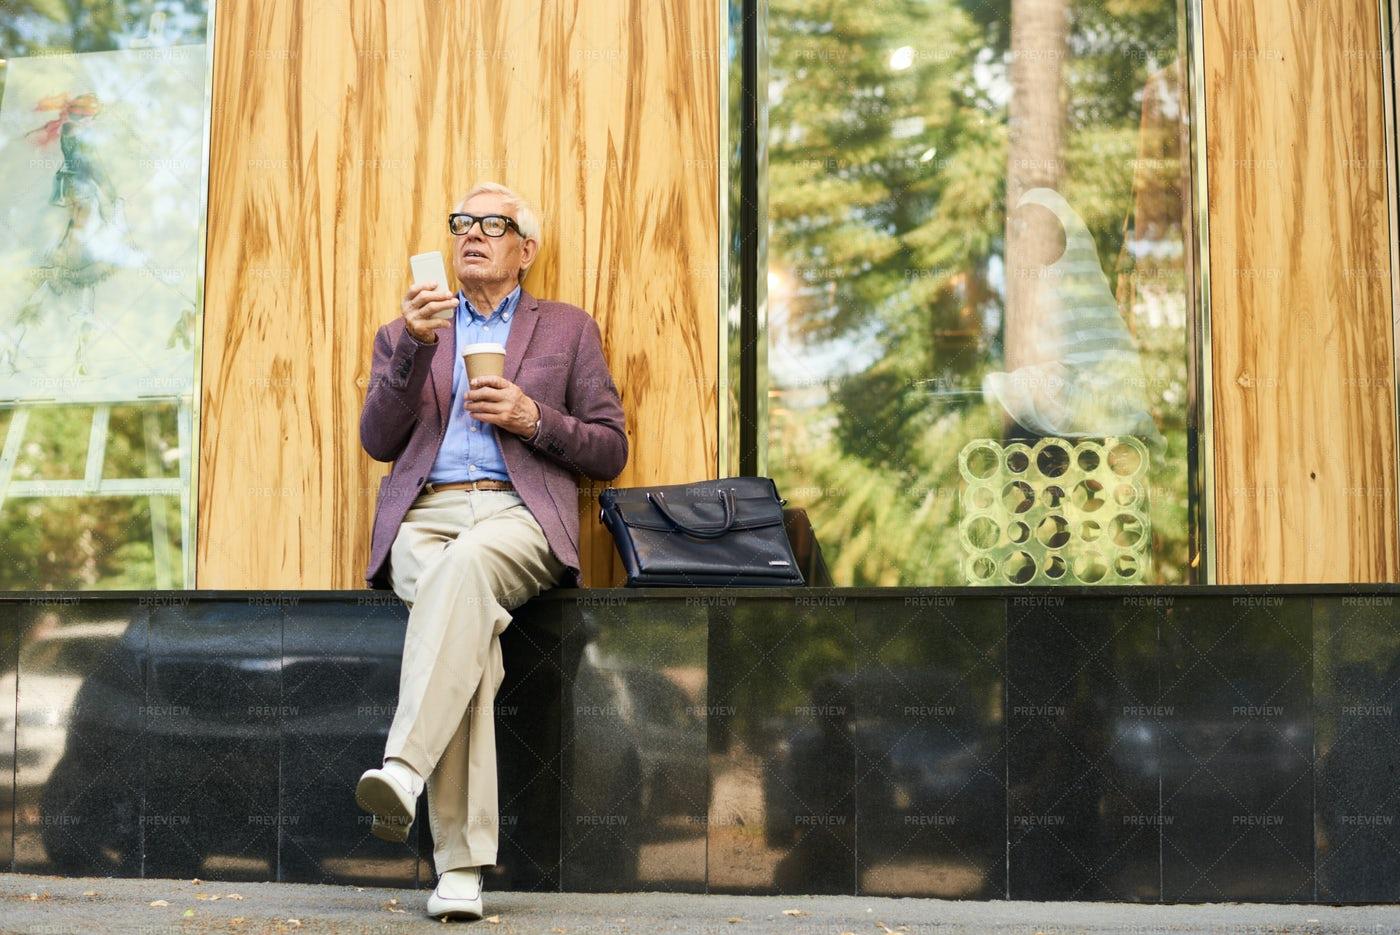 Trendy Senior Man Relaxing In...: Stock Photos